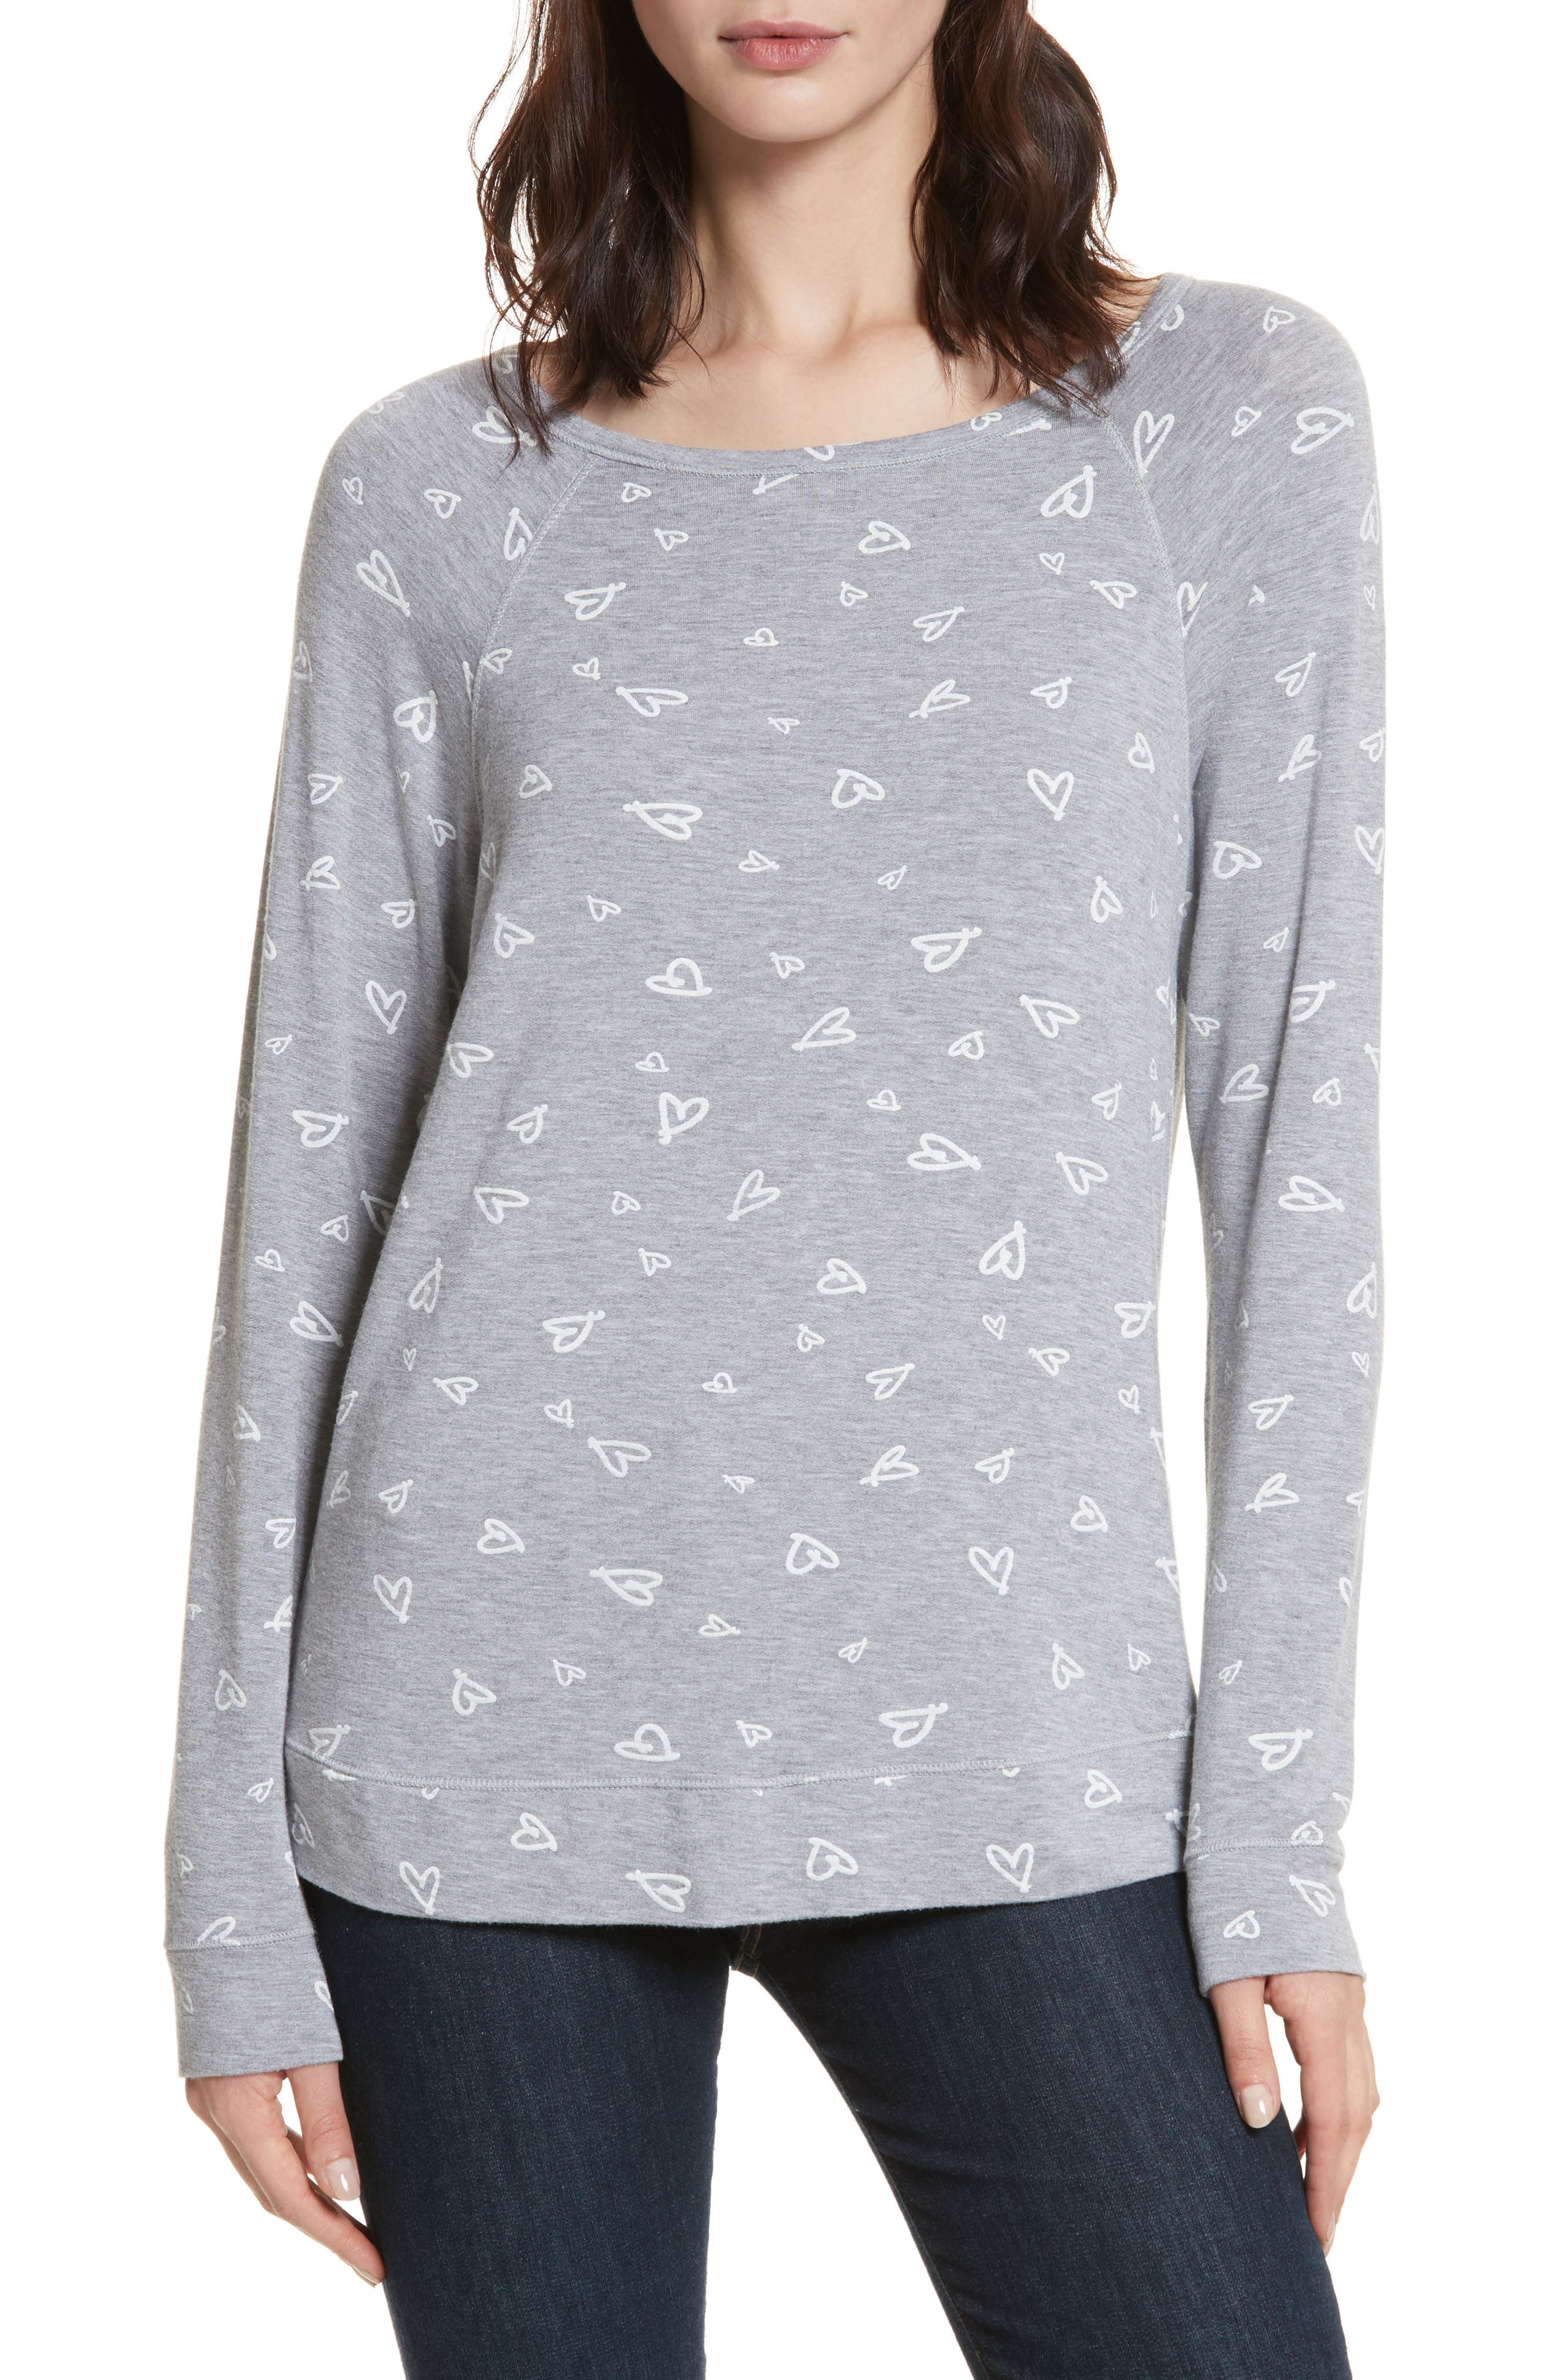 Alternate Image 1 Selected - Joie Annora B Print Cotton & Modal Blend Sweatshirt